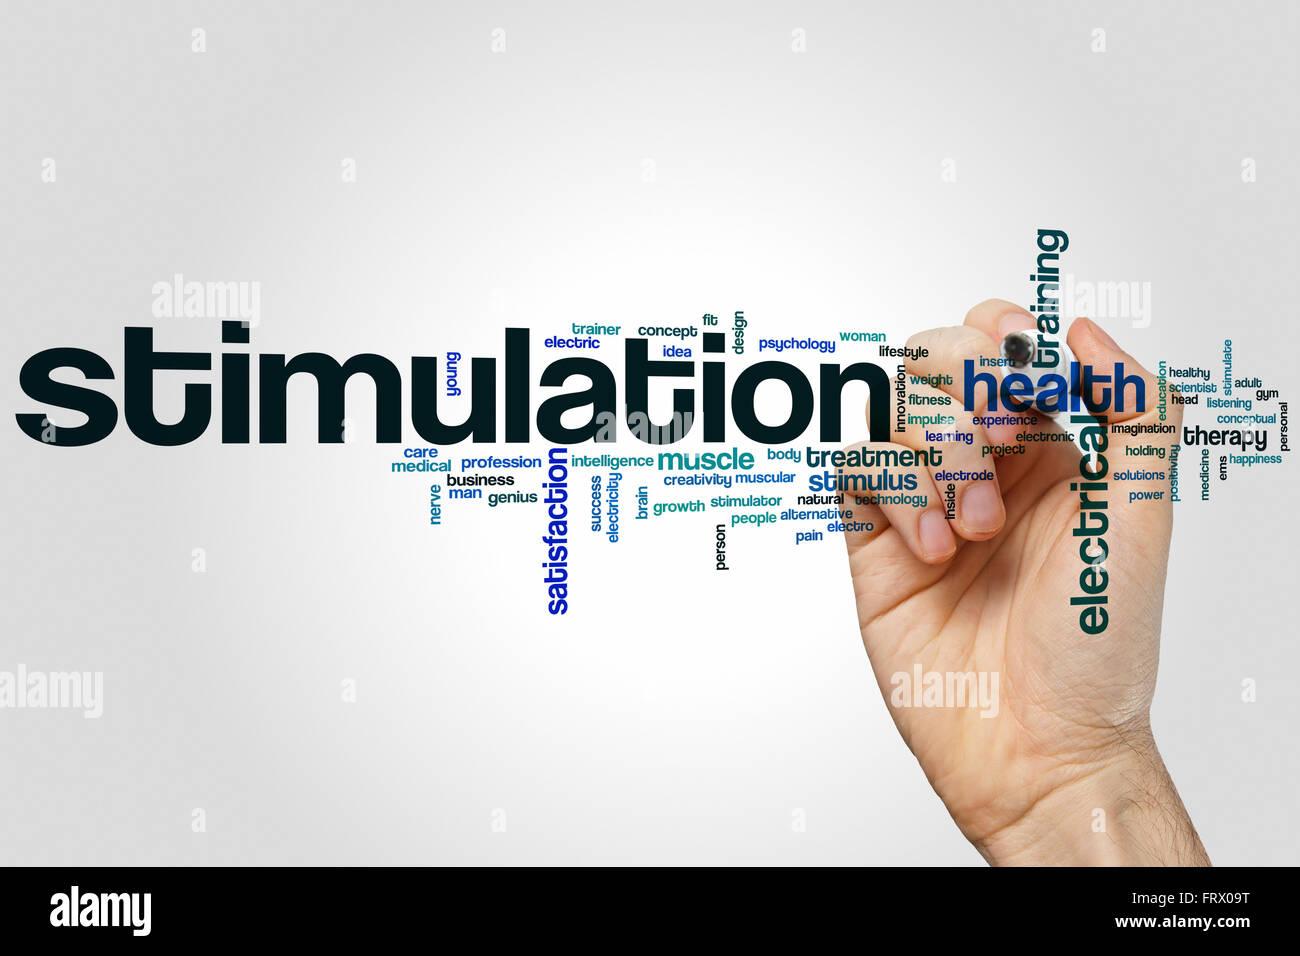 Stimulation word cloud concept Stock Photo - Alamy